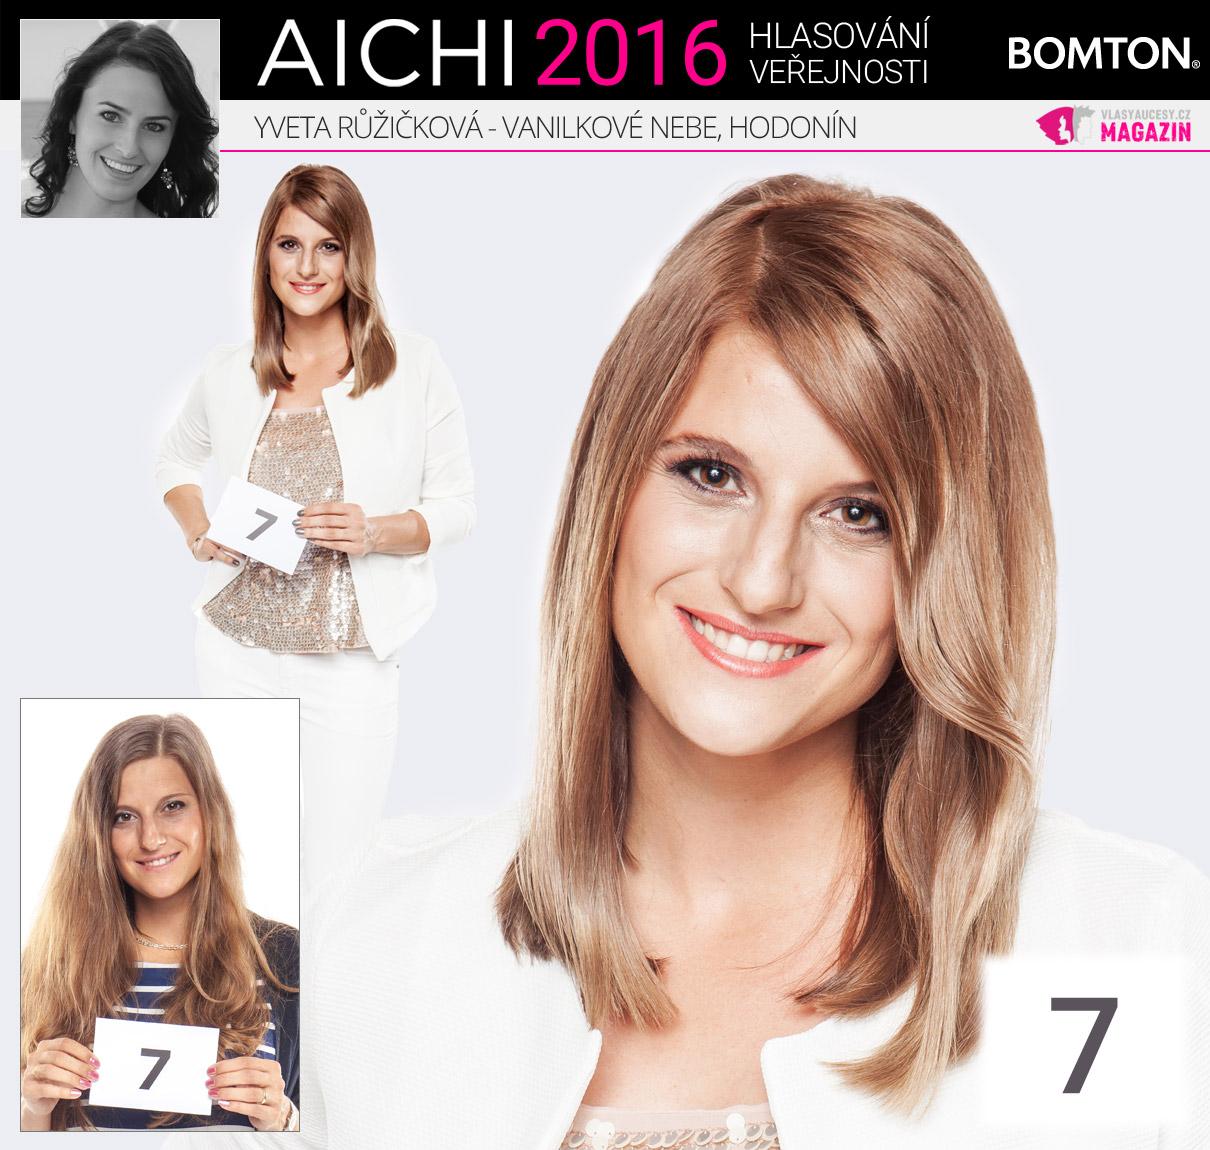 Finálová proměna AICHI 2016: Yveta Růžičková, Vanilkové Nebe, Hodonín